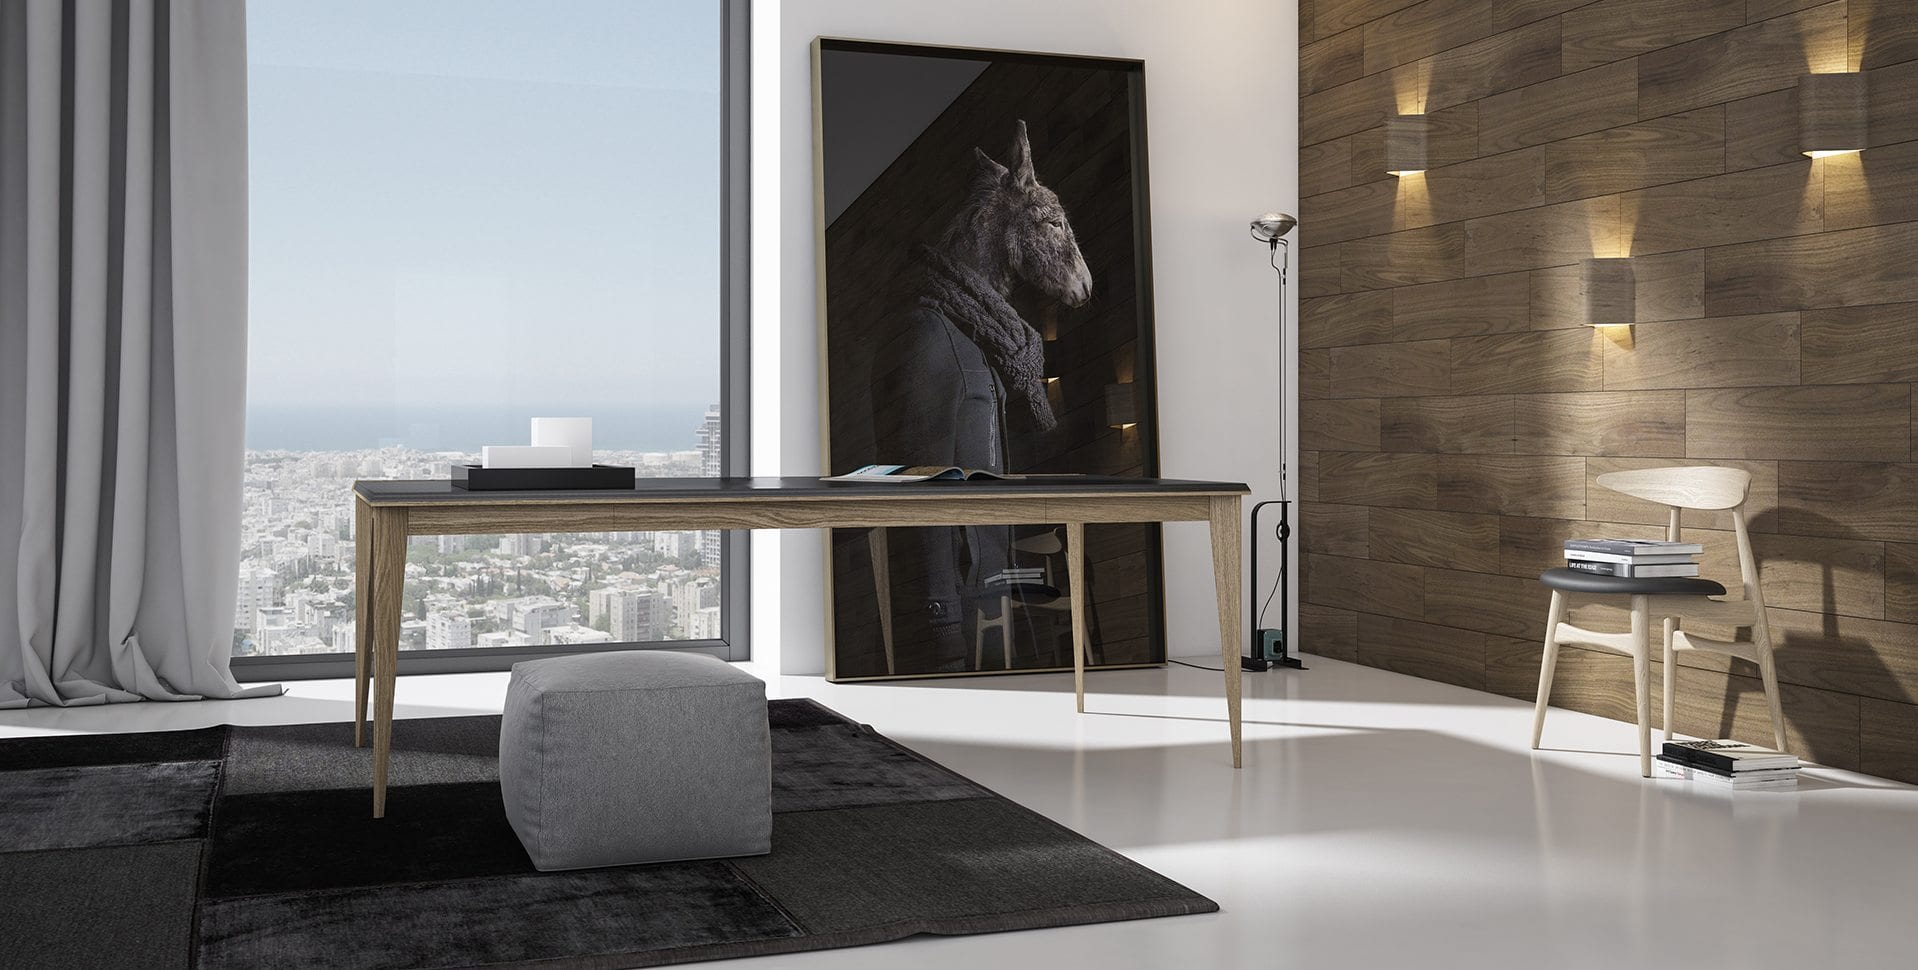 Maayan-Golan_Architectural-Visualization_product-visualization_wall-tiles_lighting-fixture_itai-bar-on_office_05